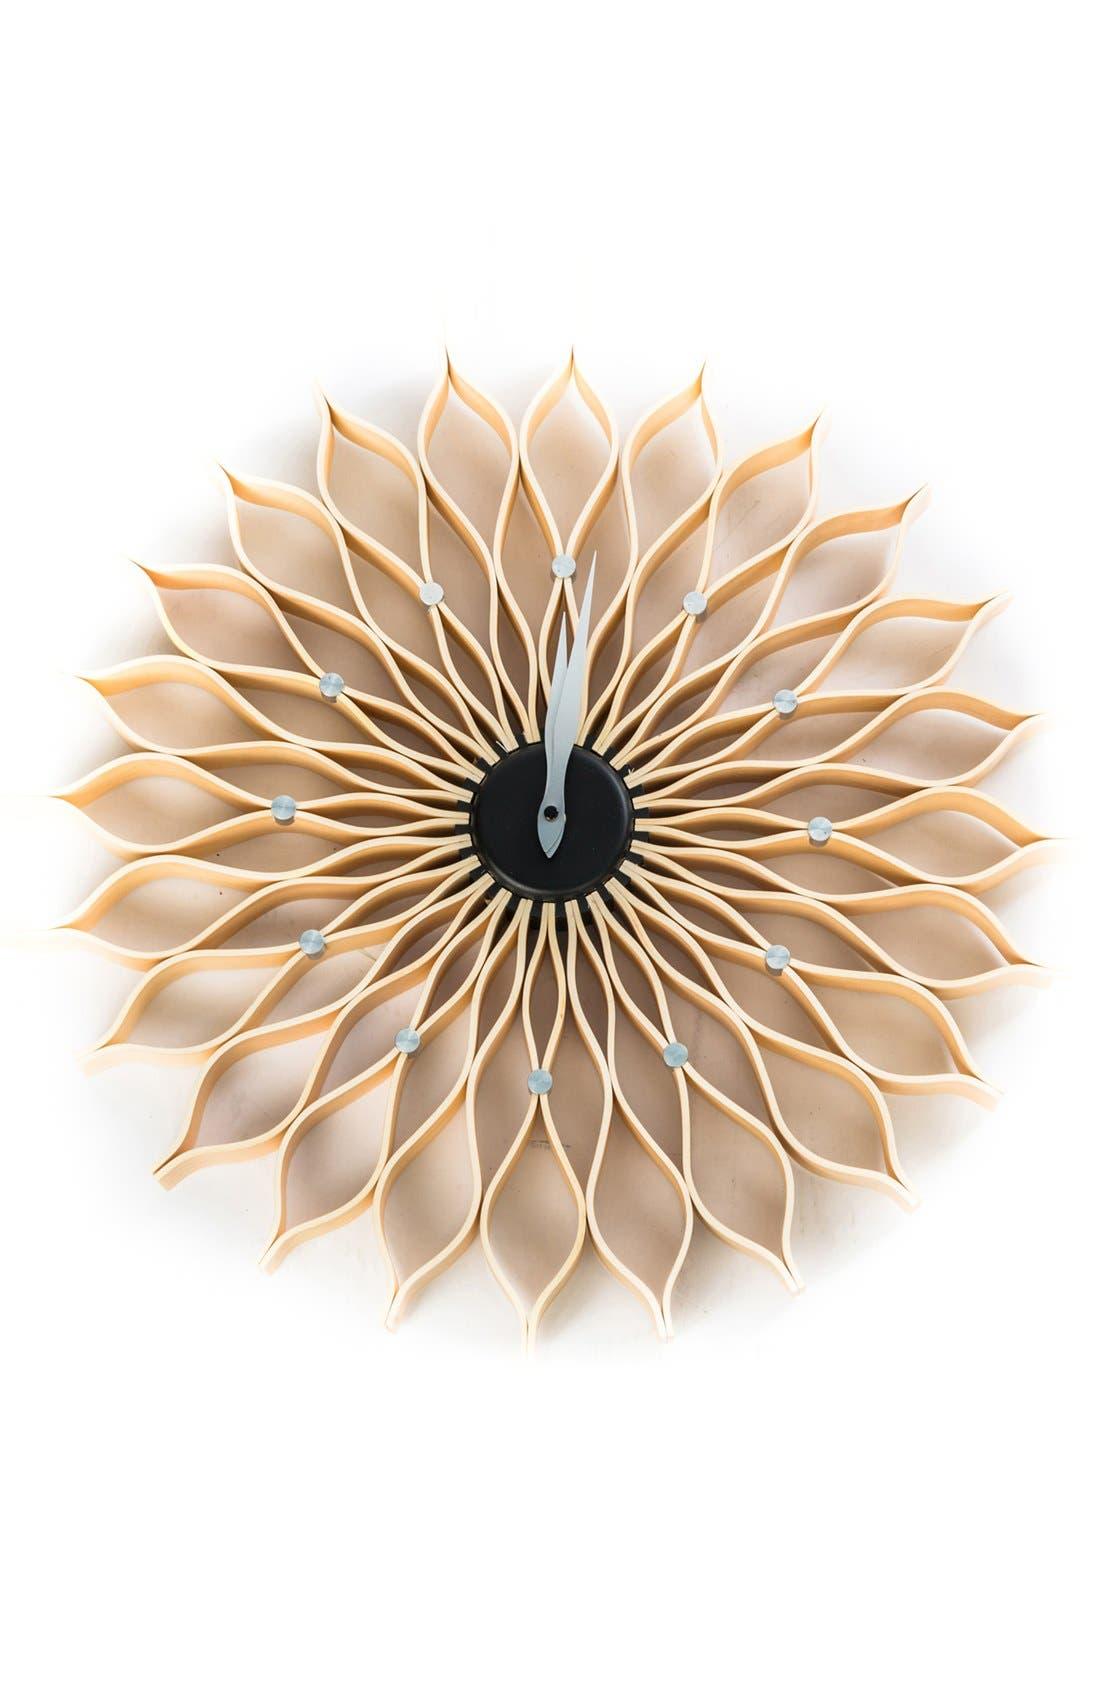 Alternate Image 1 Selected - World Friendly World 'Sunflower' Wall Clock